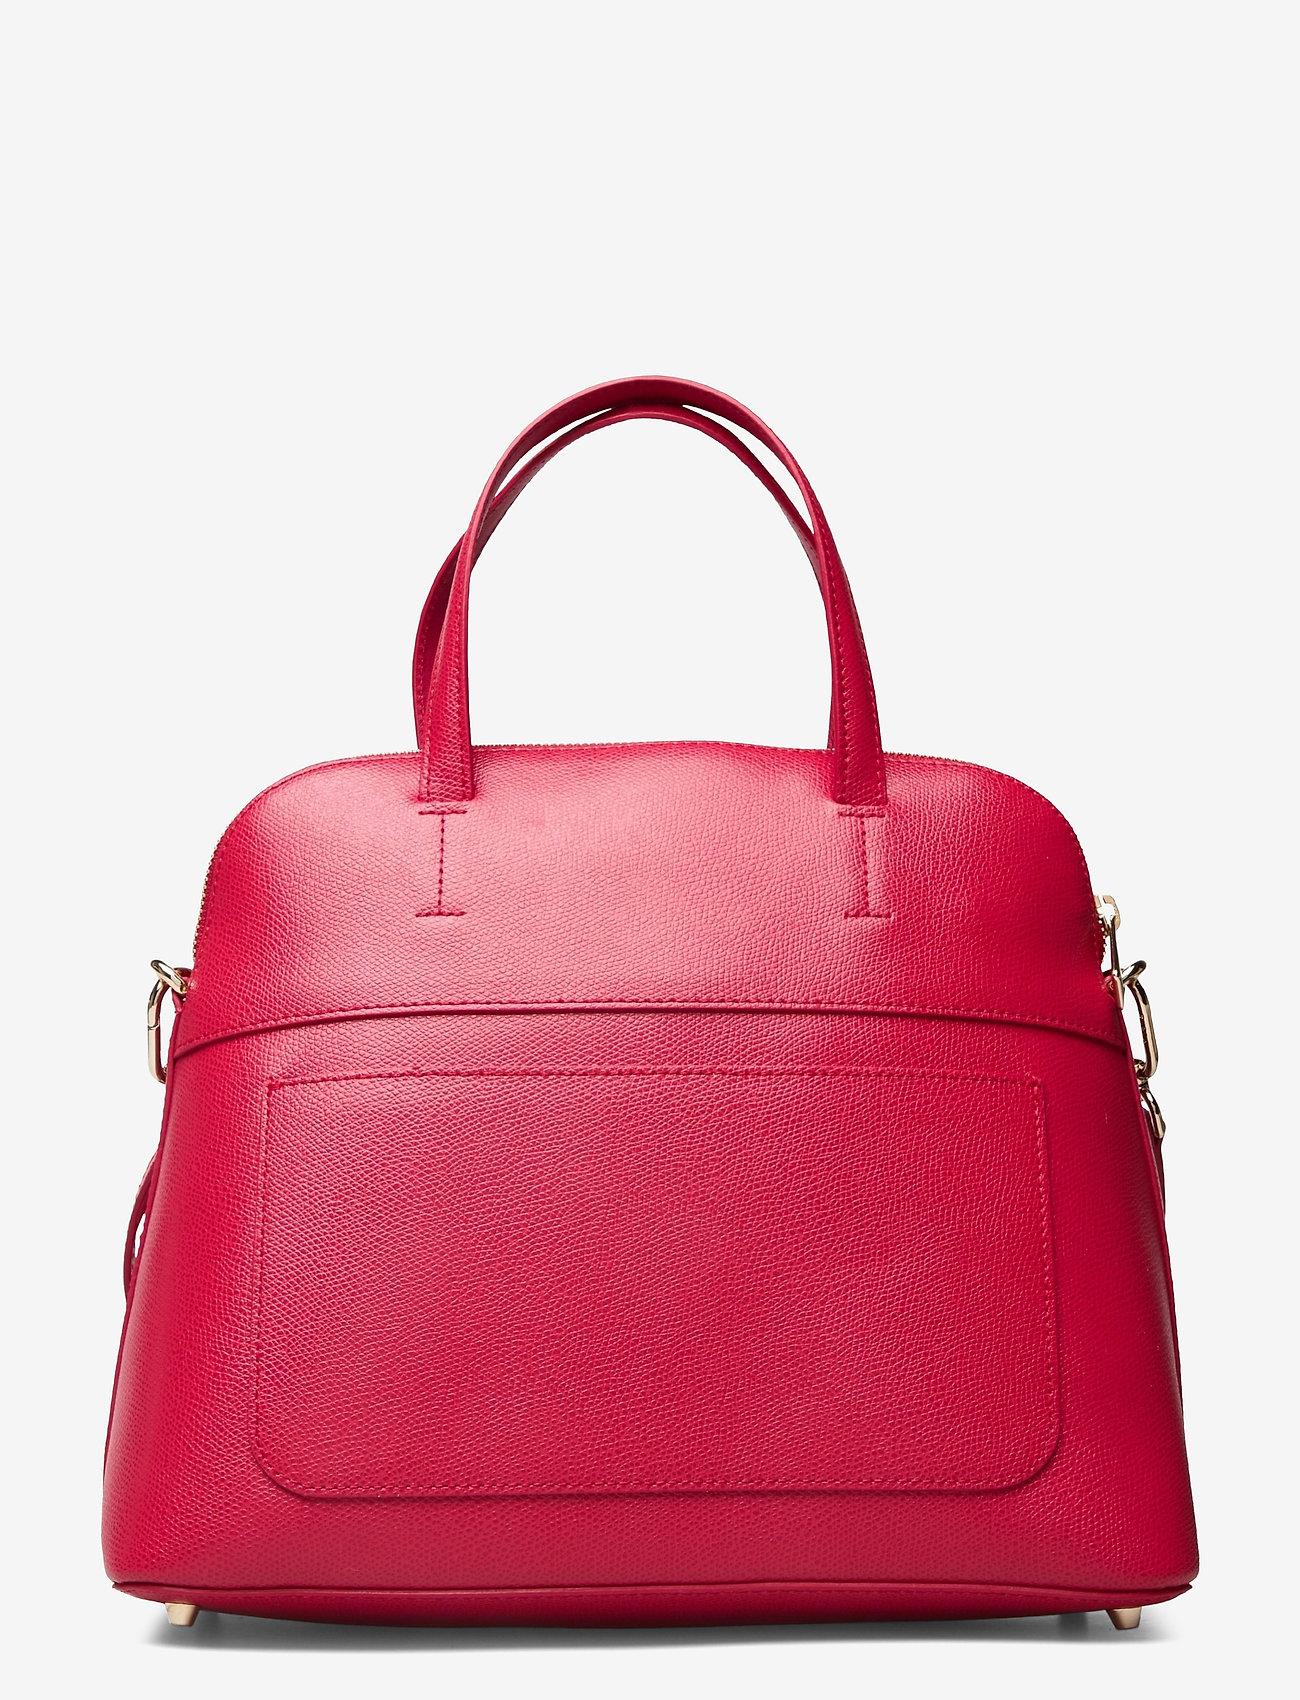 Furla - FURLA PIPER M DOME - handväskor - ruby - 1